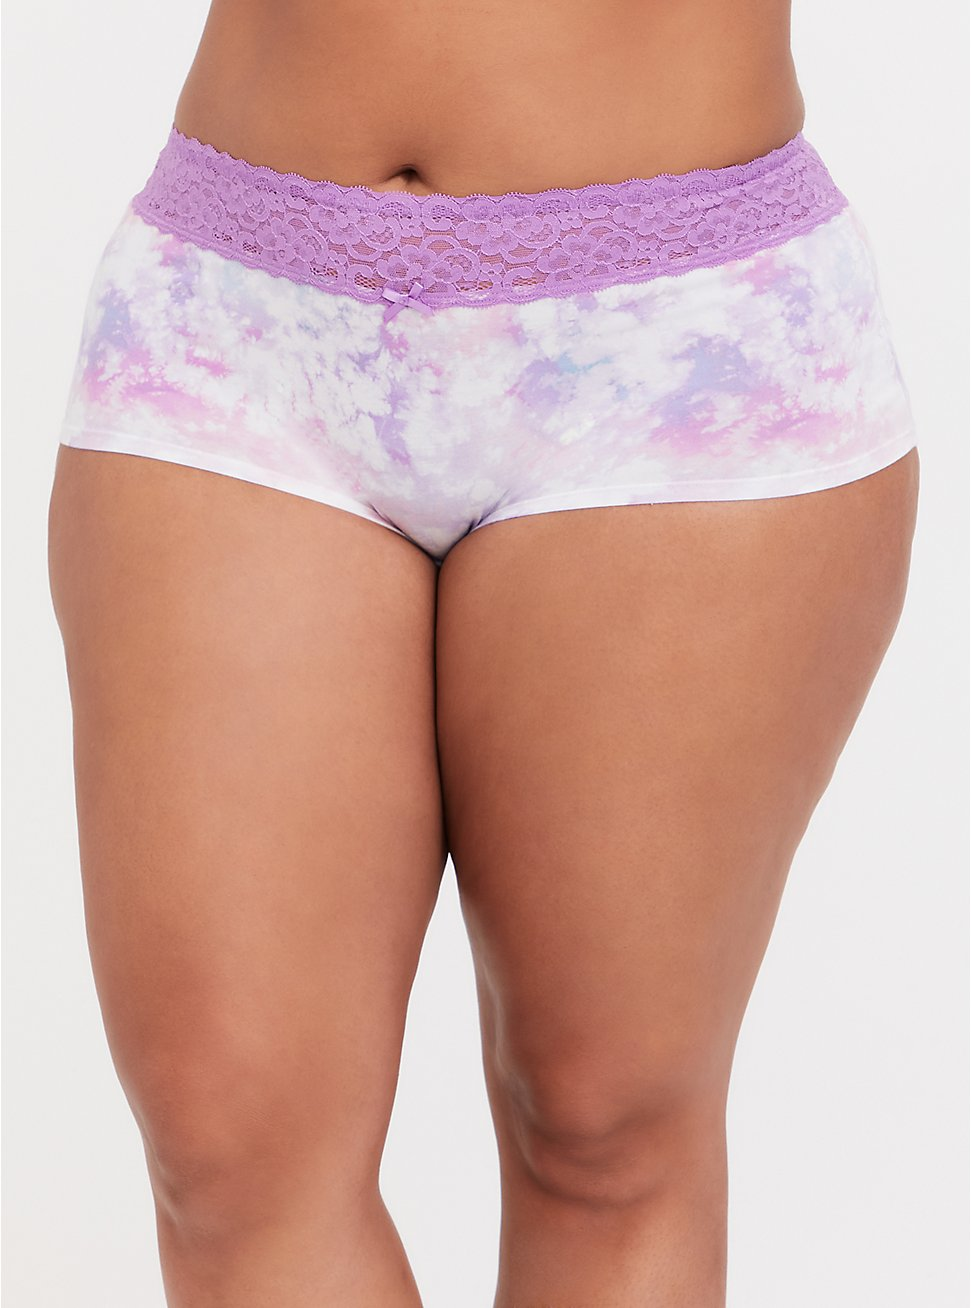 Pink & Purple Tie Dye Wide Lace Cotton Boyshort Panty, COLORFUL NICE DYE, hi-res